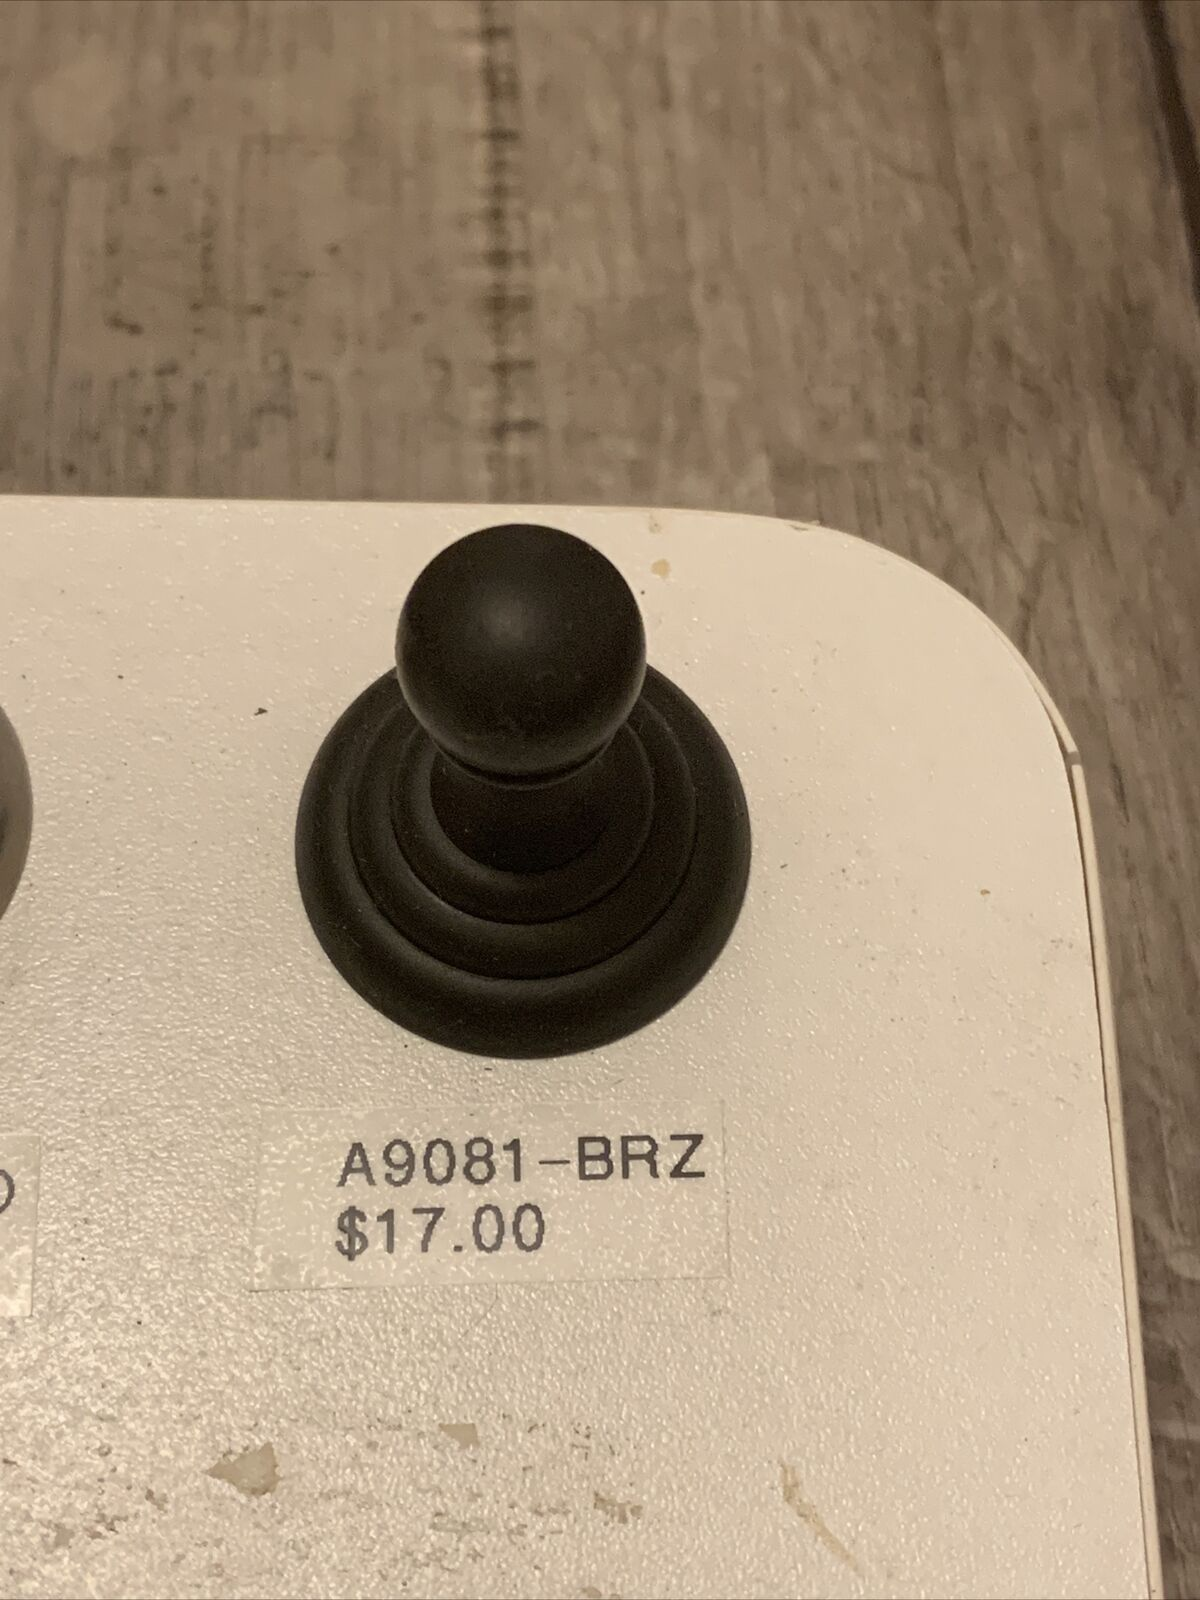 "Alno Creations A9081-BRZ Bronze Single Robe Hook 1-1/2"" Polished Brass"